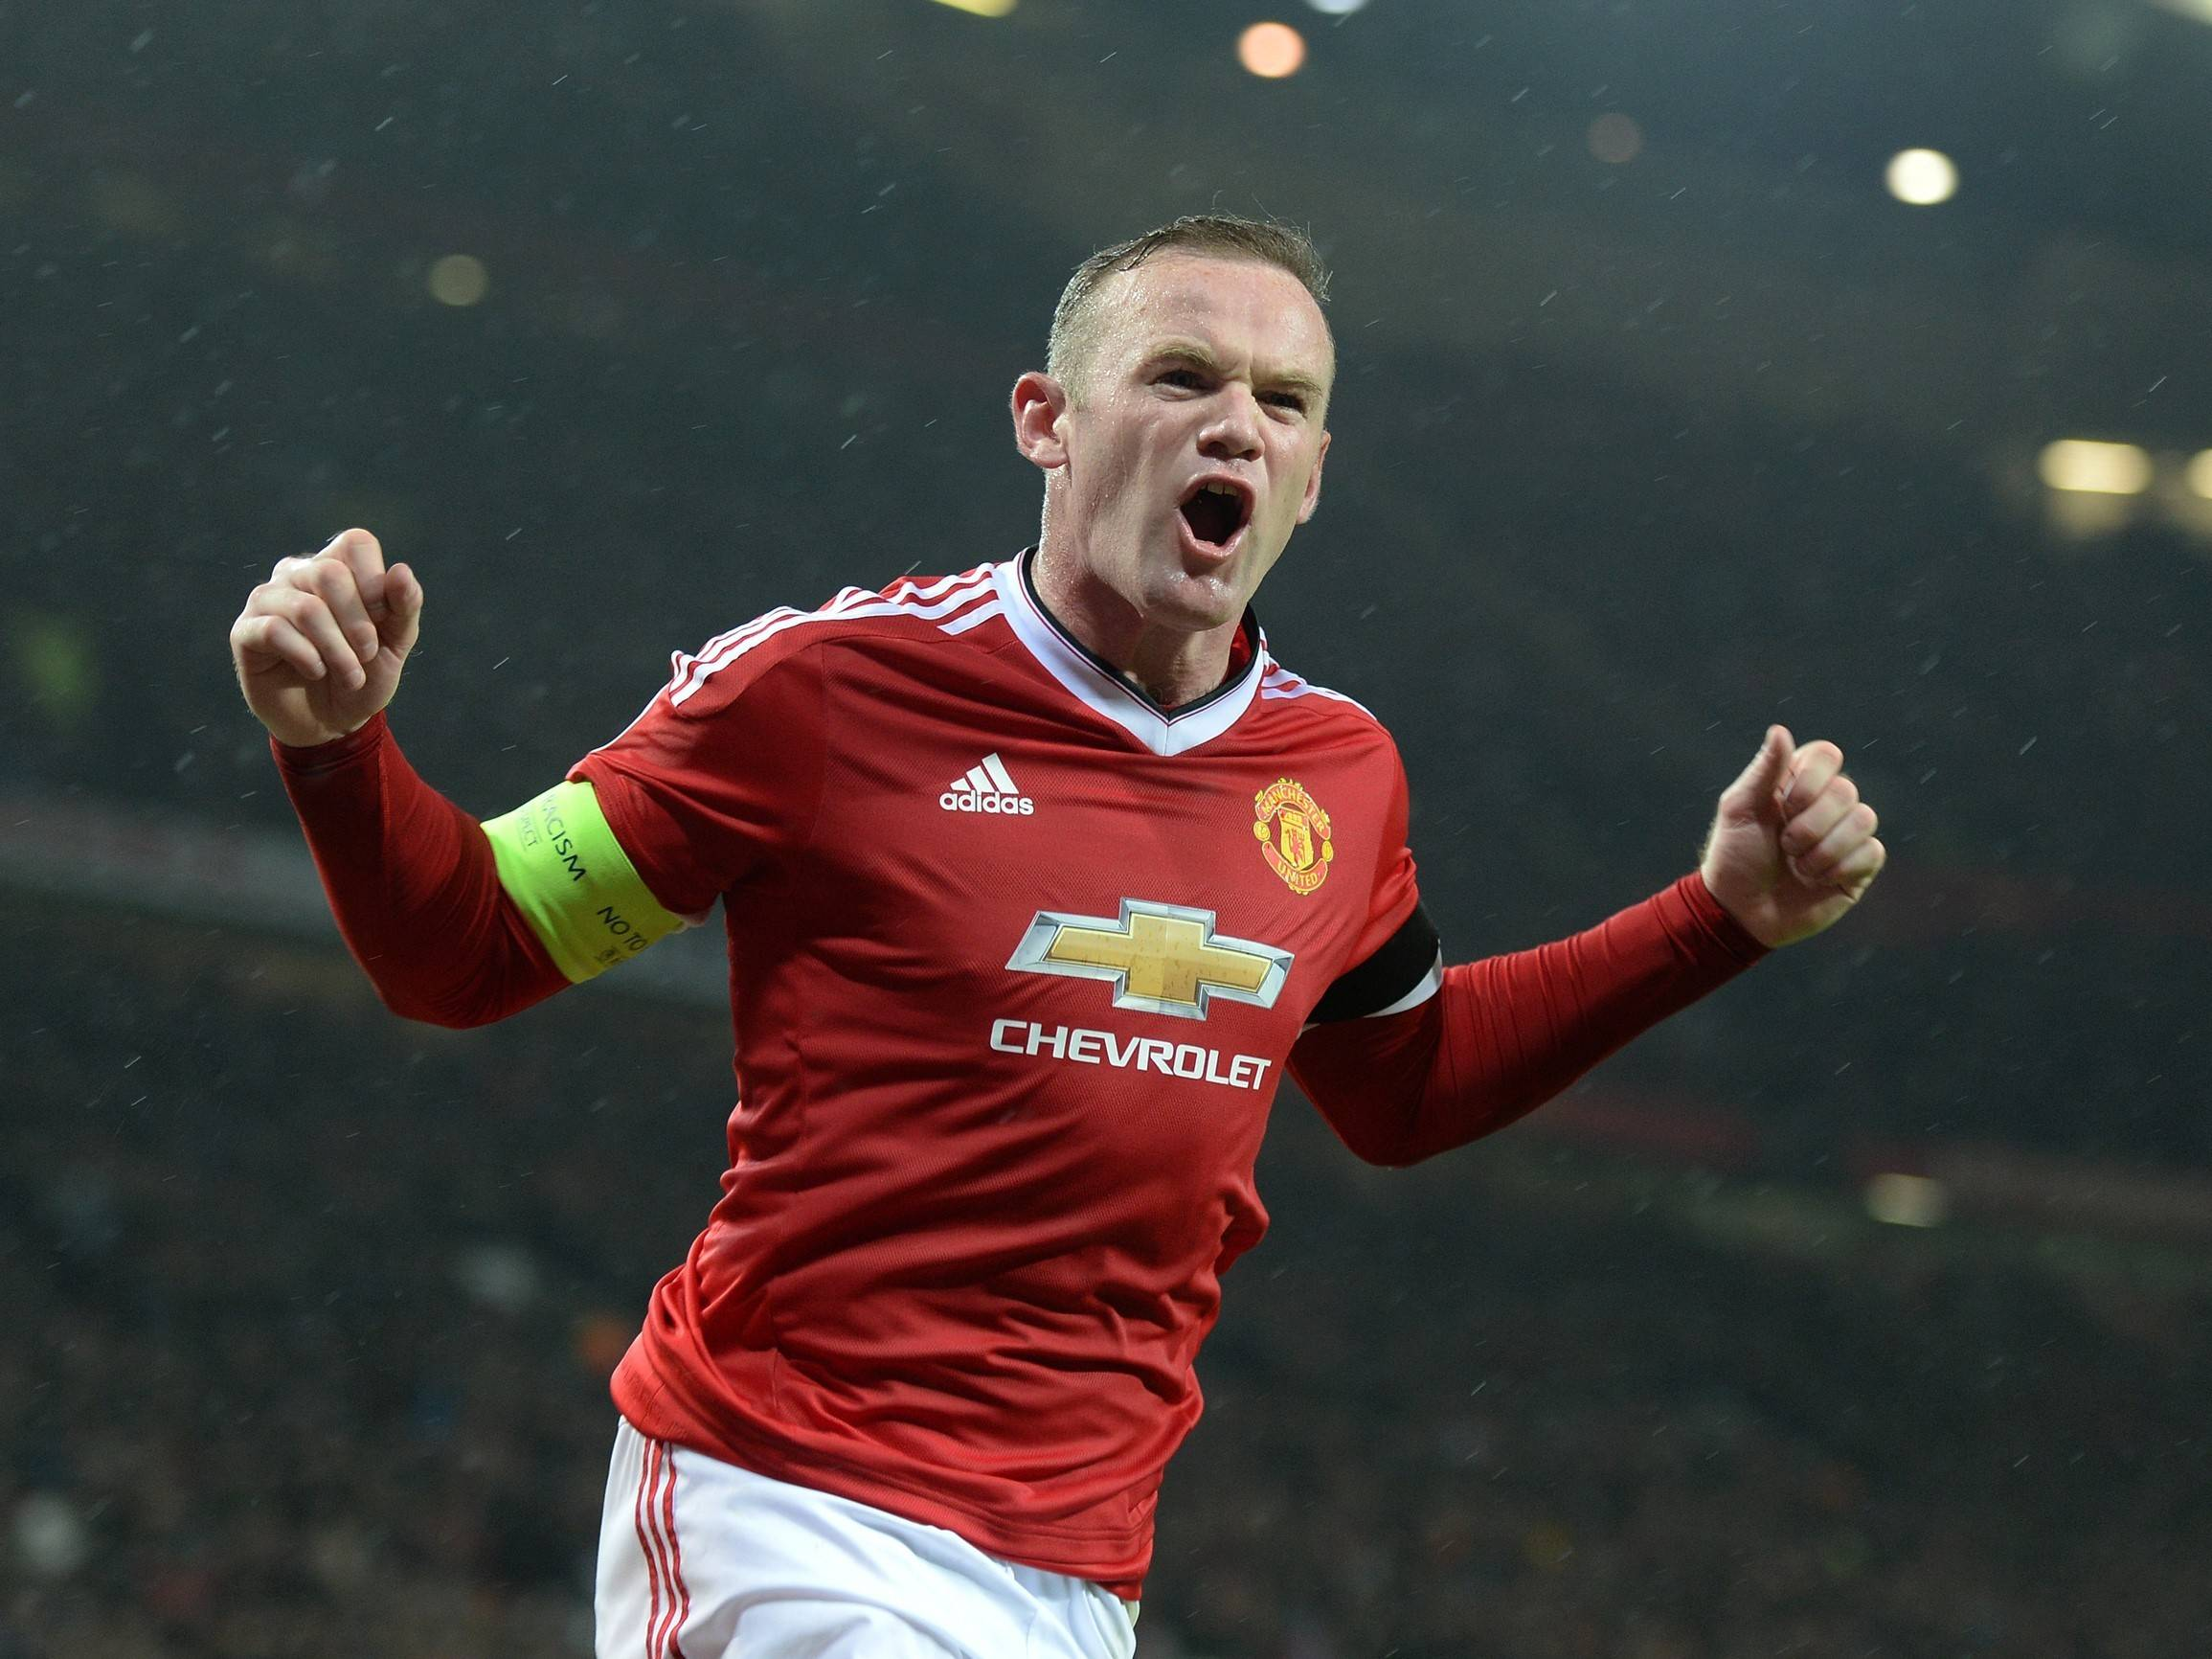 Wayne Rooney stays at Manchester United despite China transfer links